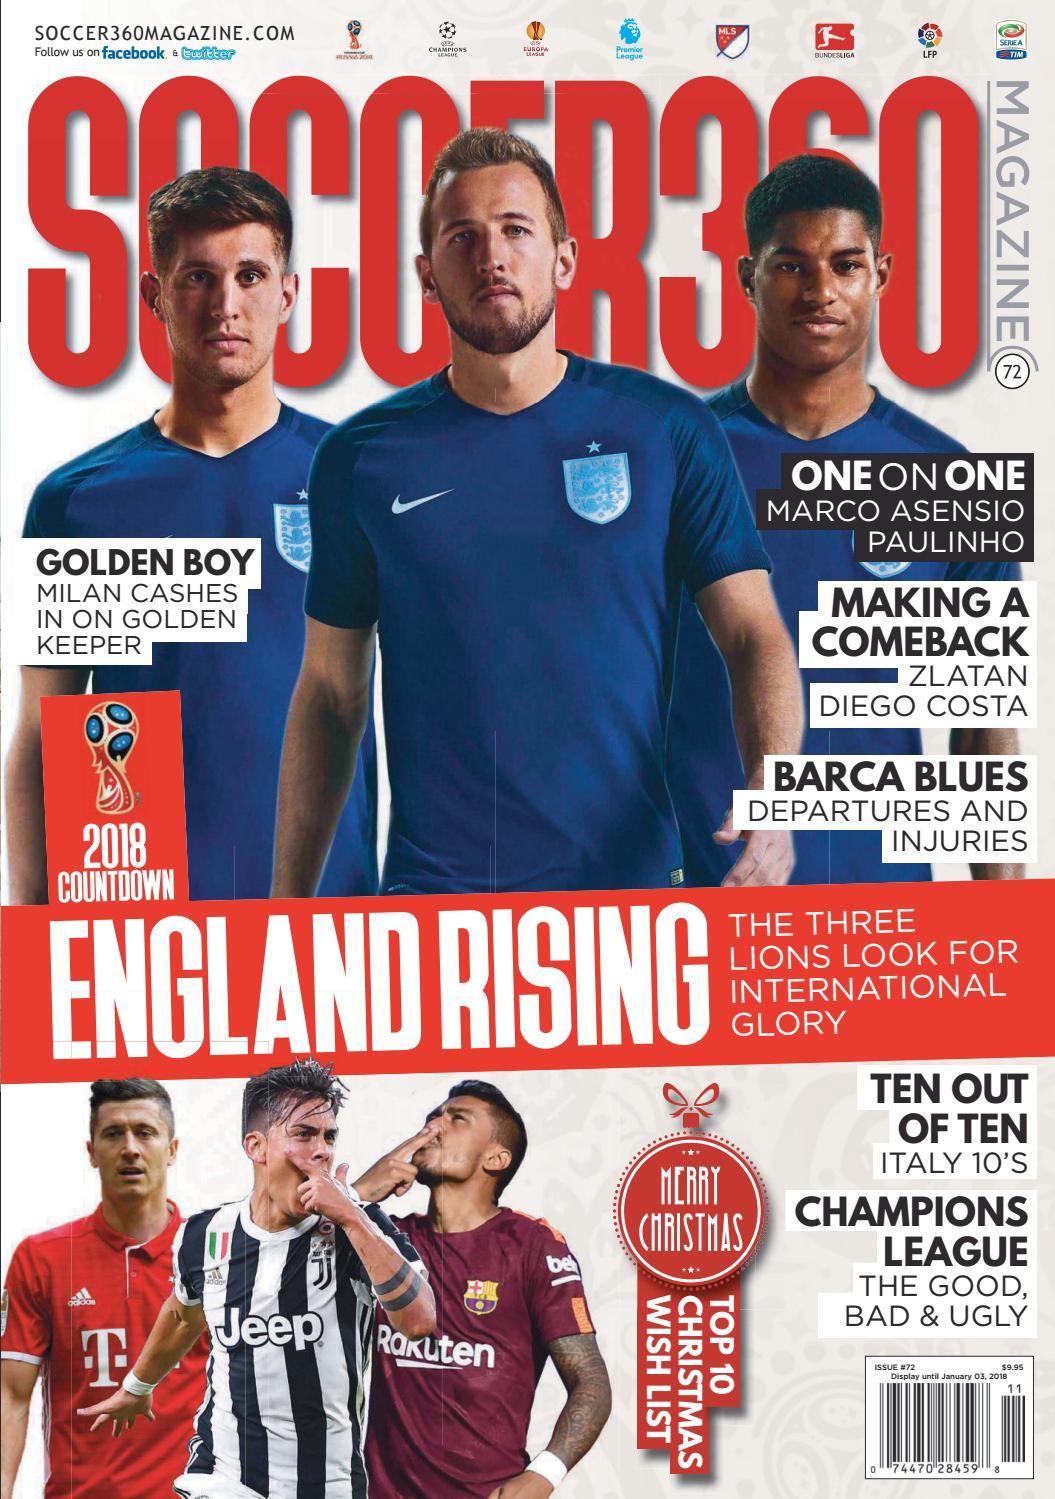 747e55550e6f4f Soccer 360 Magazine Issue 72 November   December 2017 by Soccer 360  Magazine - issuu